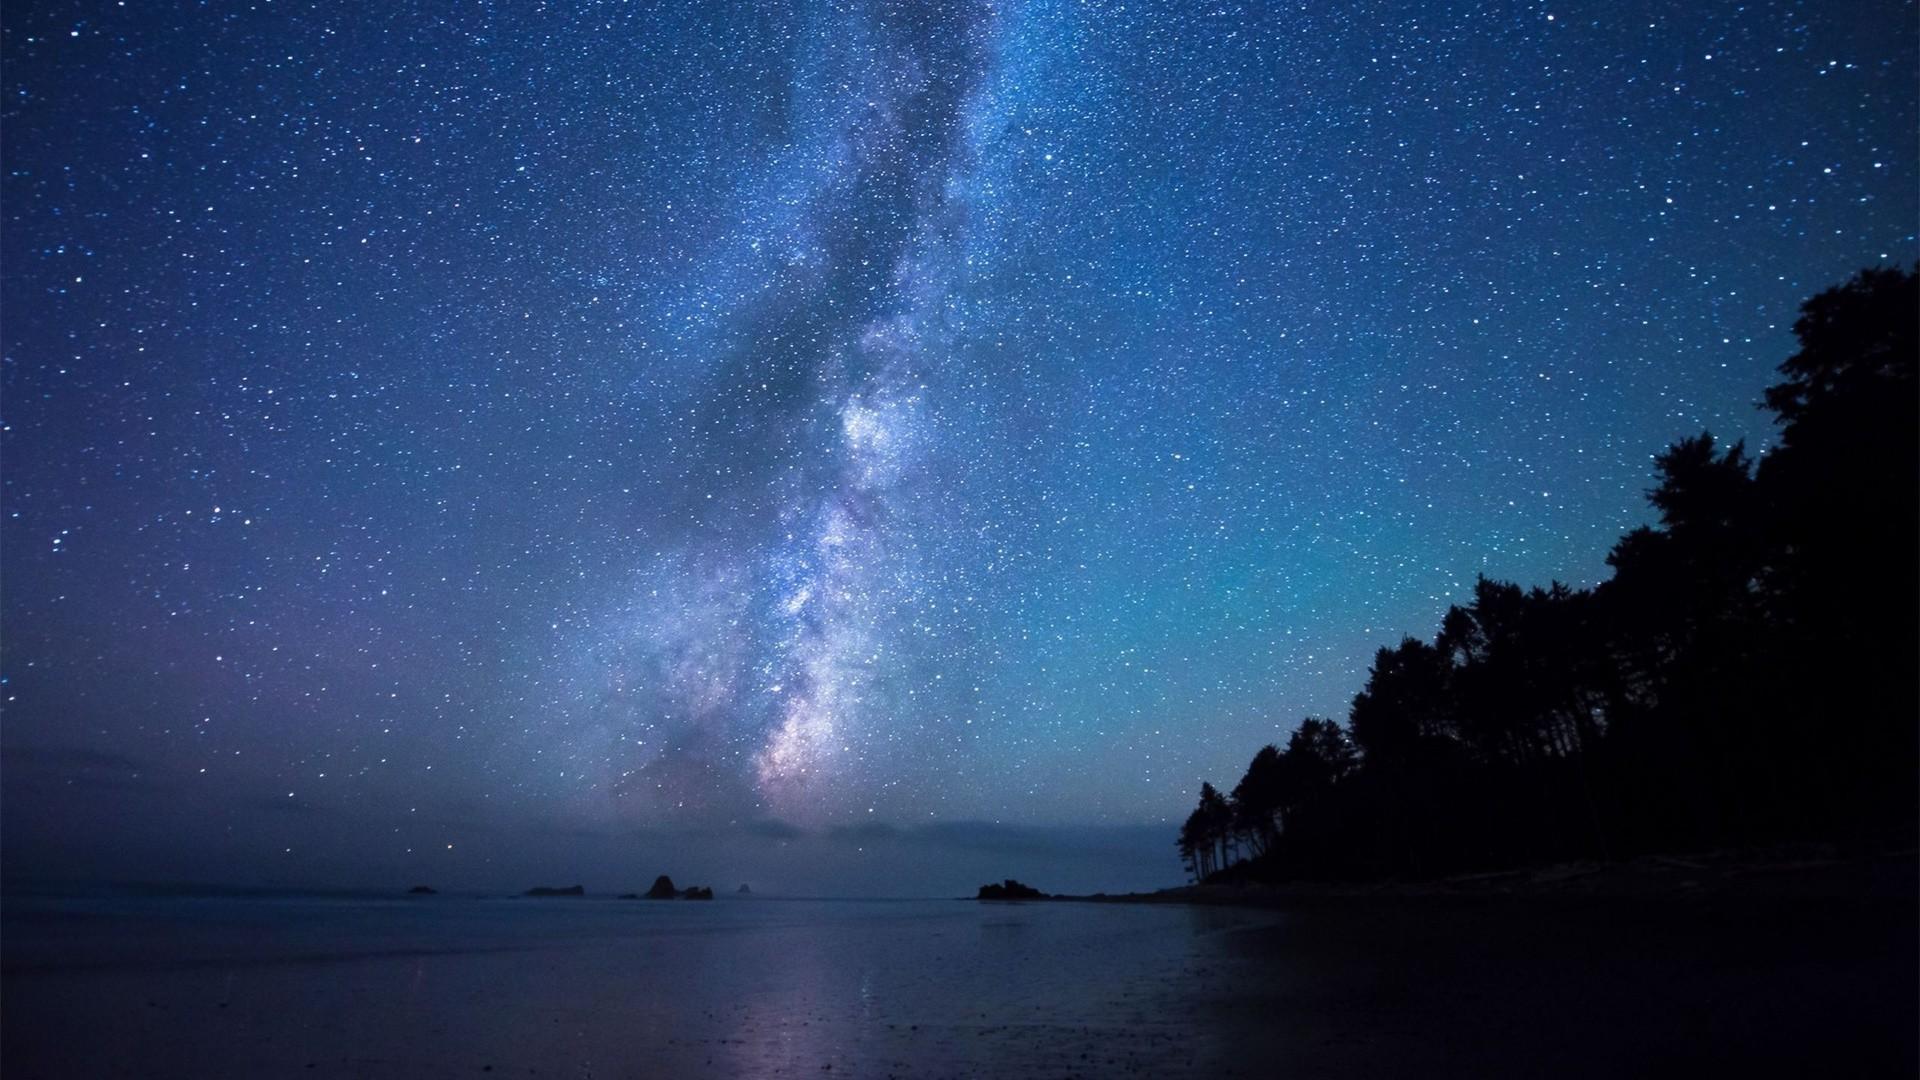 Картинки звездное небо фото